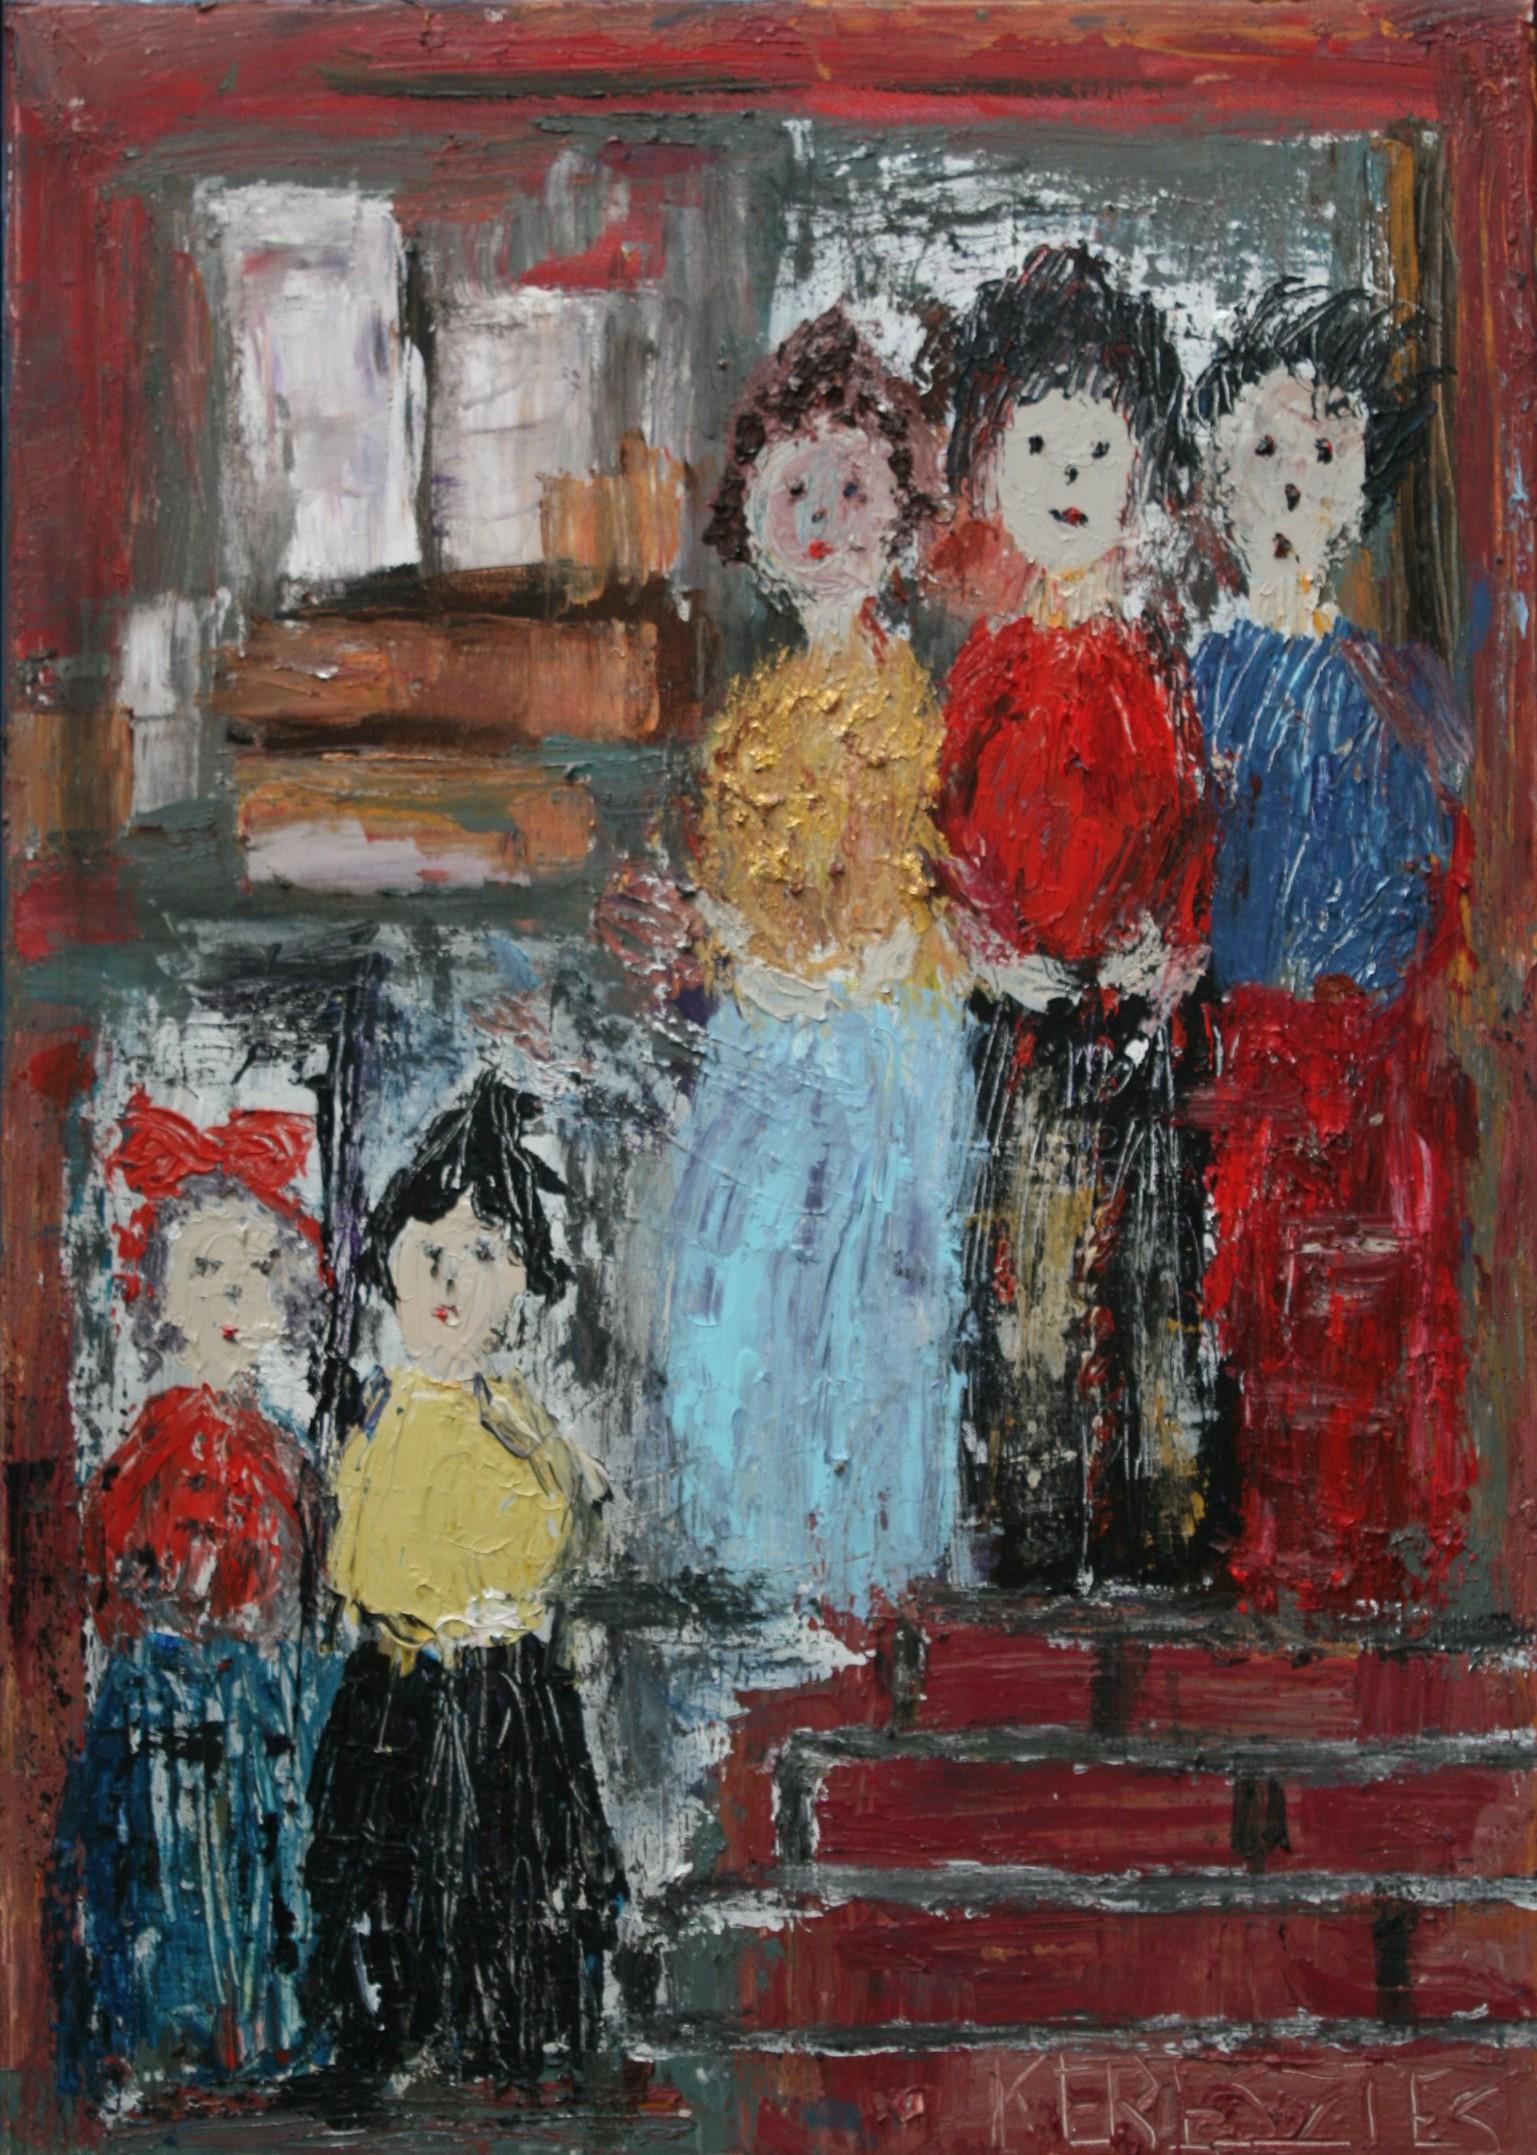 toile 36 - magdalena keresztes, artiste peintre à amiens